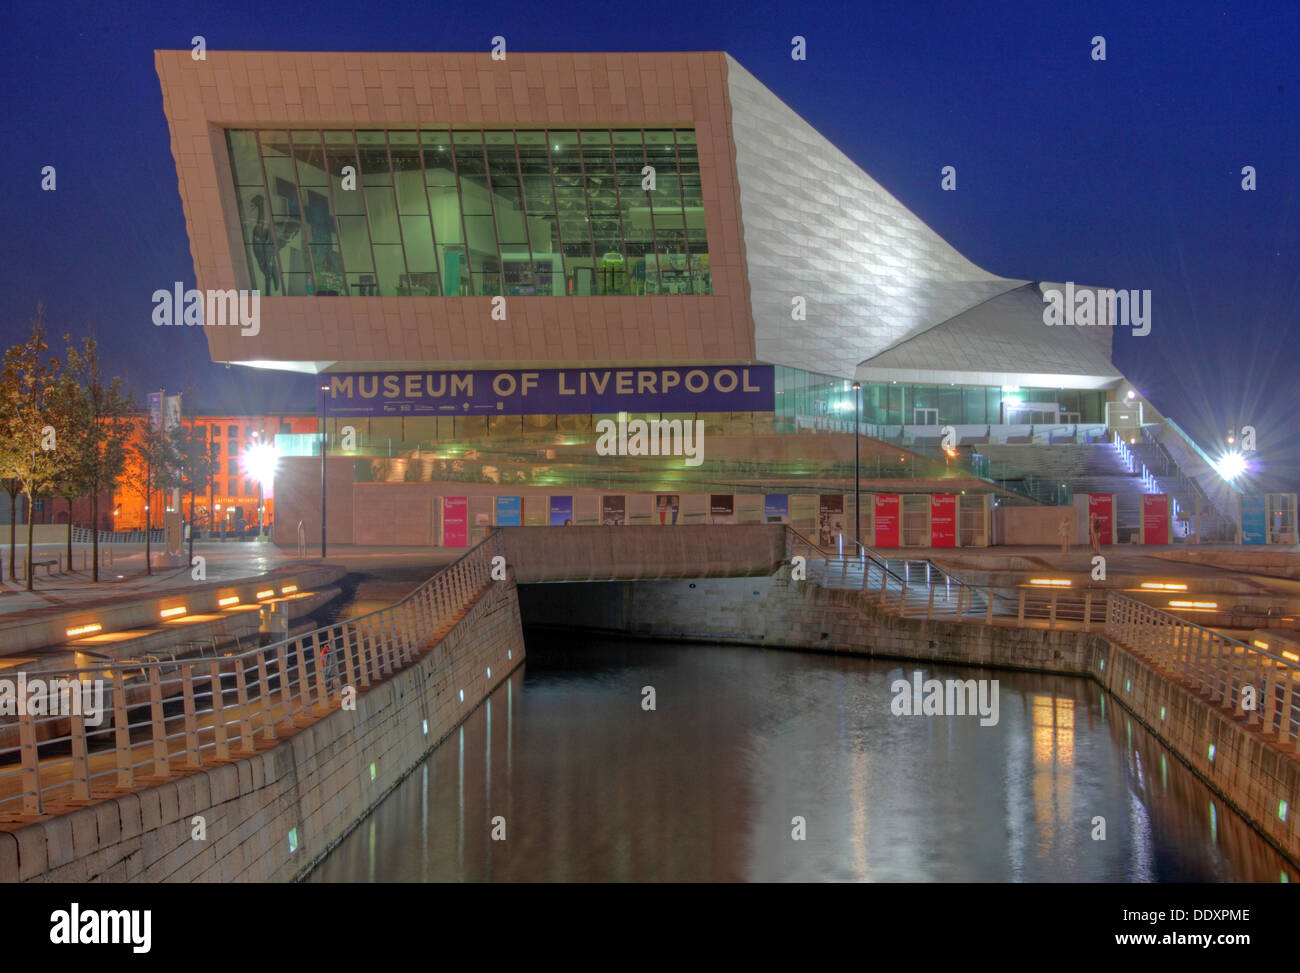 Laden Sie dieses Alamy Stockfoto Museum of Liverpool bei Dämmerung, Merseyside, England, UK - DDXPME